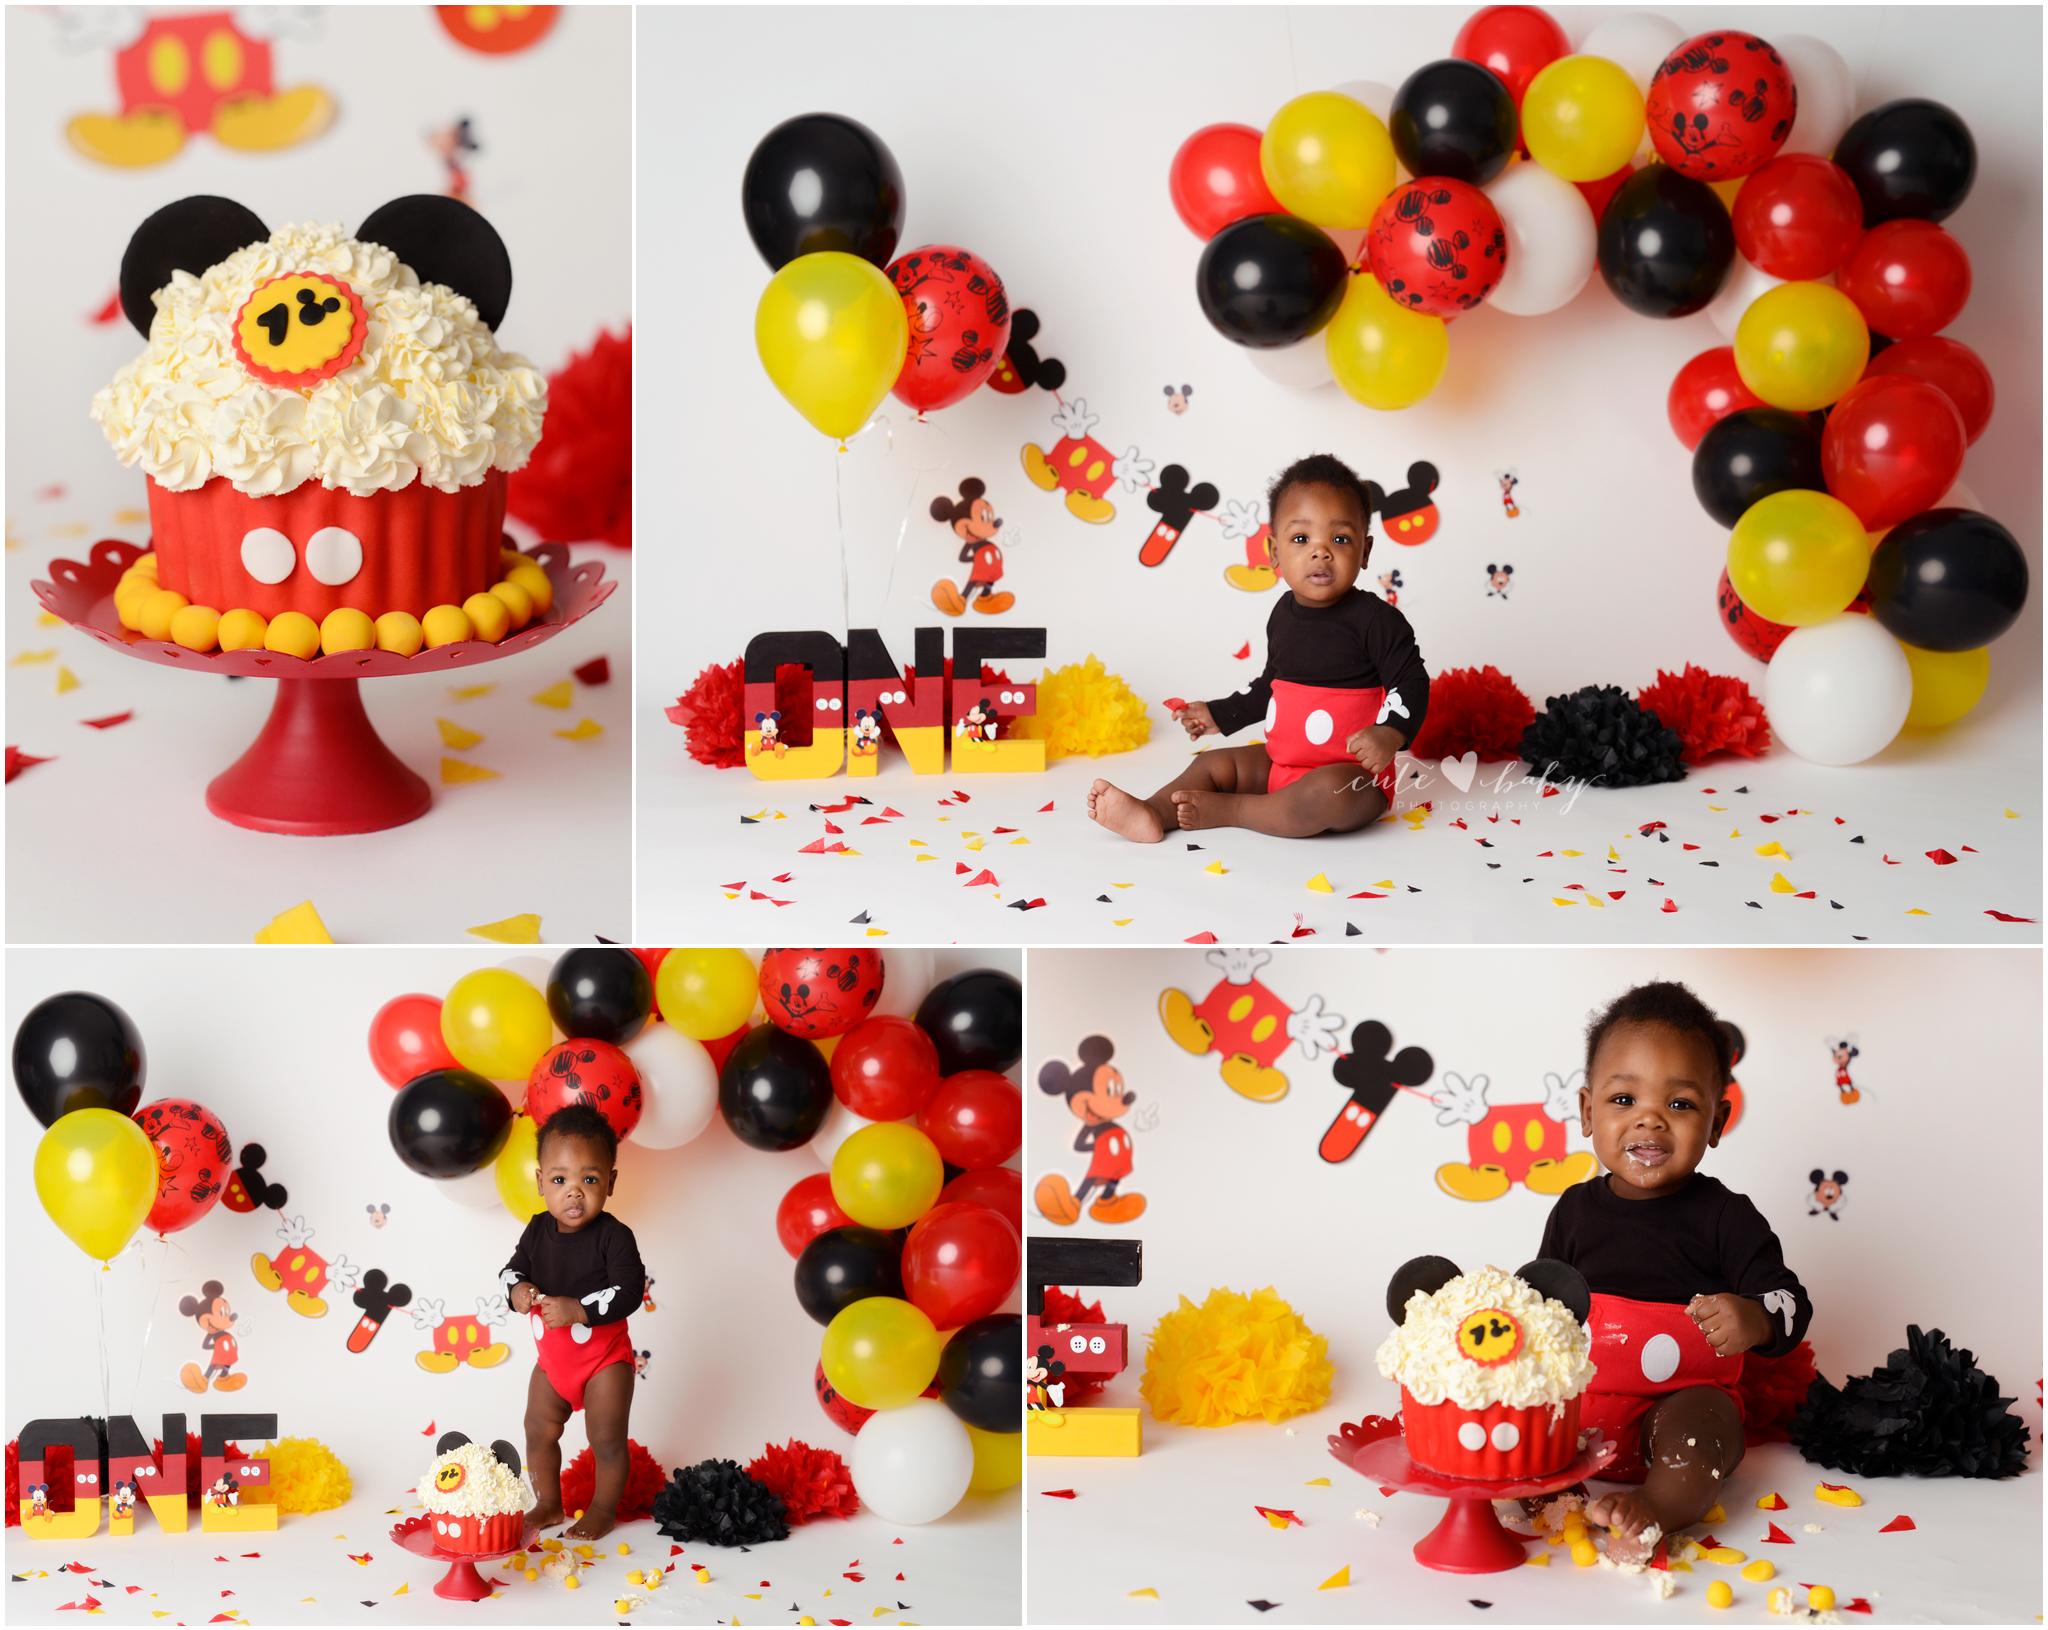 cake smash Manchester, Baby Photography Manchester, 1st Birthday photography, Cake Smash Mickey Mouse